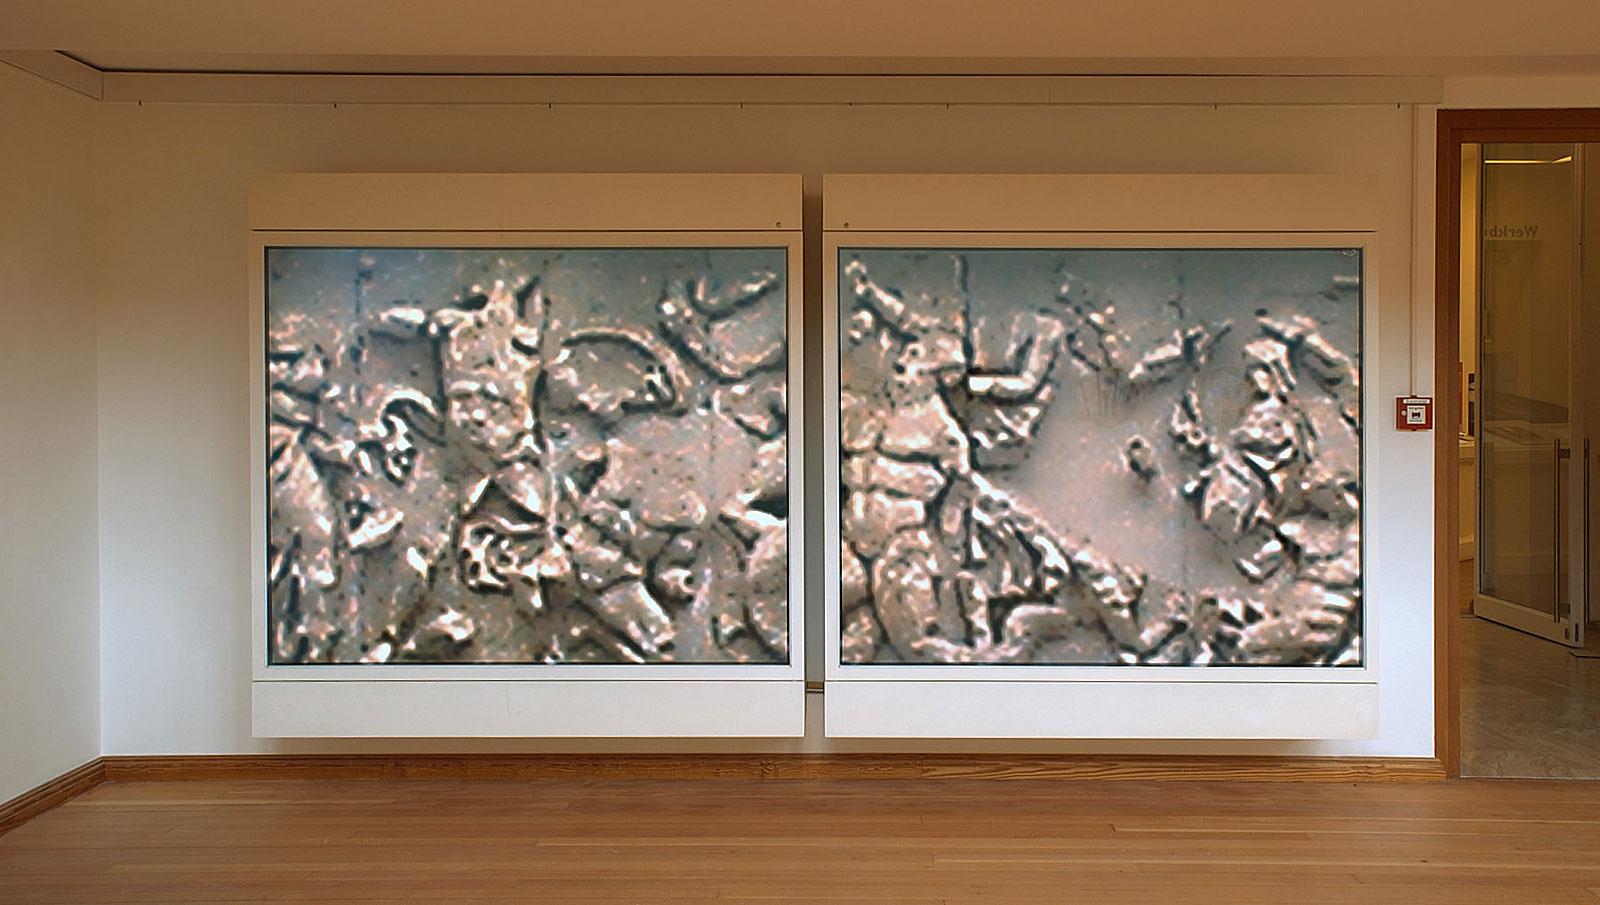 Das verblasste Ideal - Klassik heute, Martin Gropius Bau, Berlin